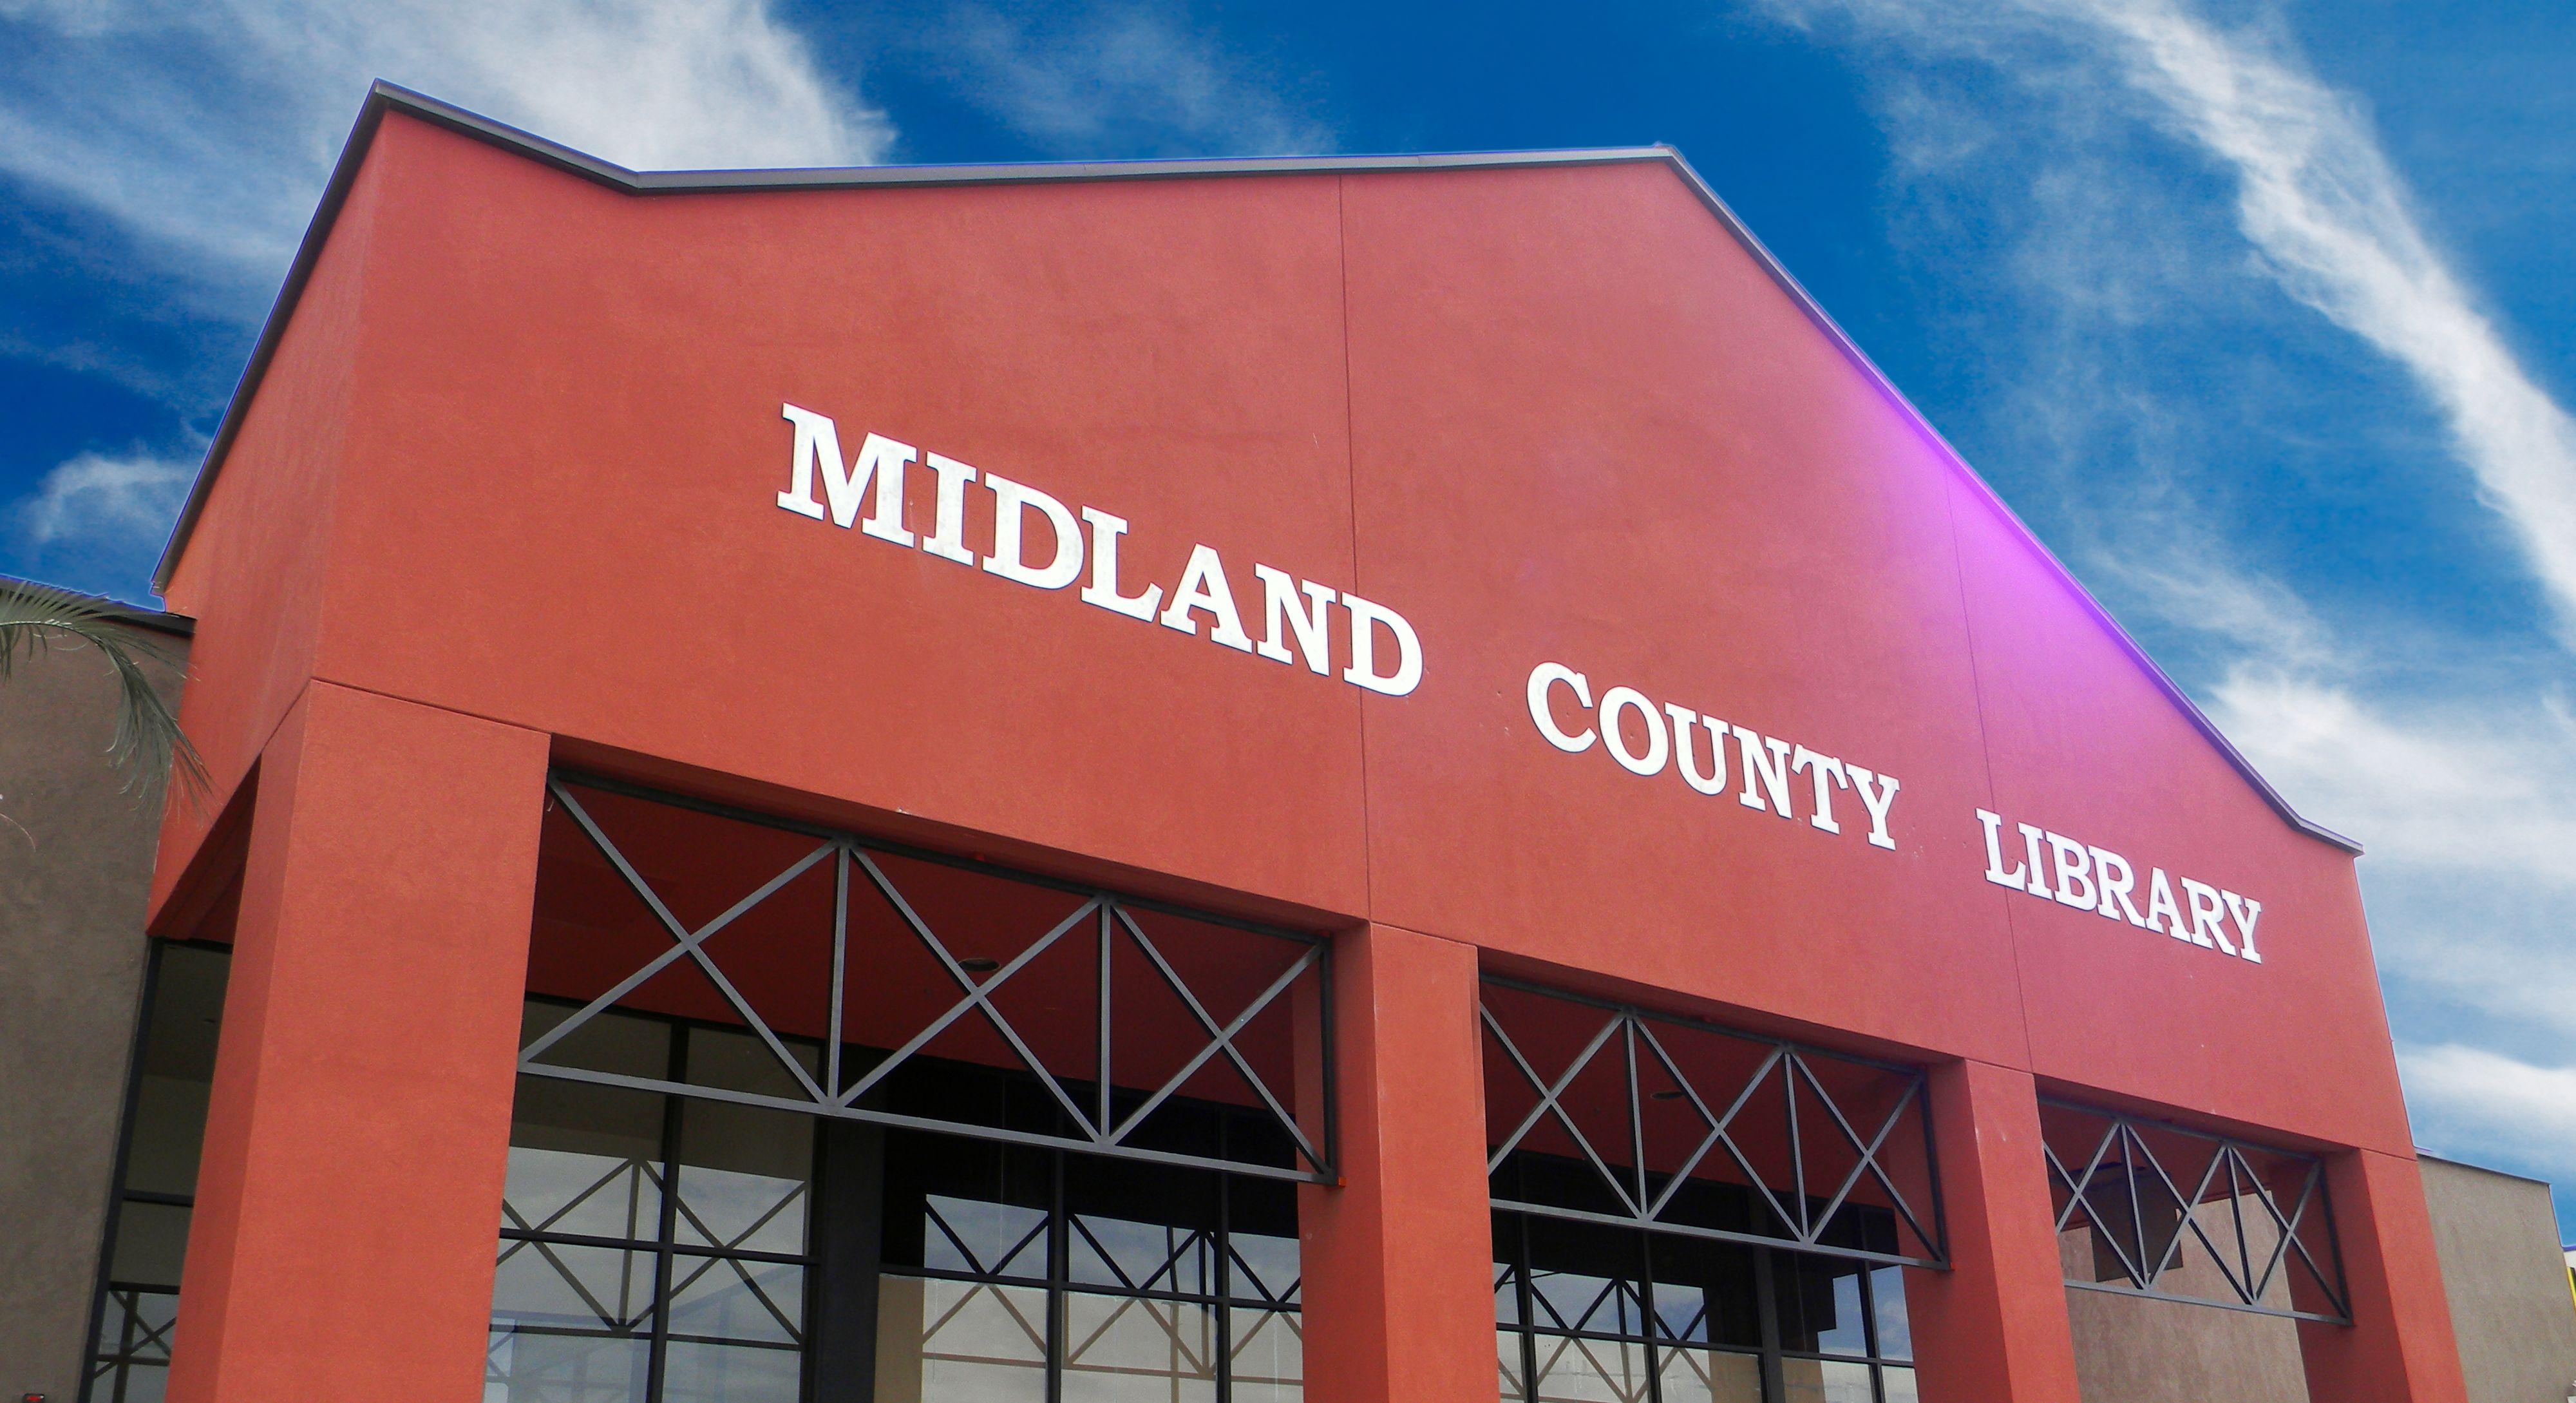 Midland County Library Summer reading, Midland, Summer slide